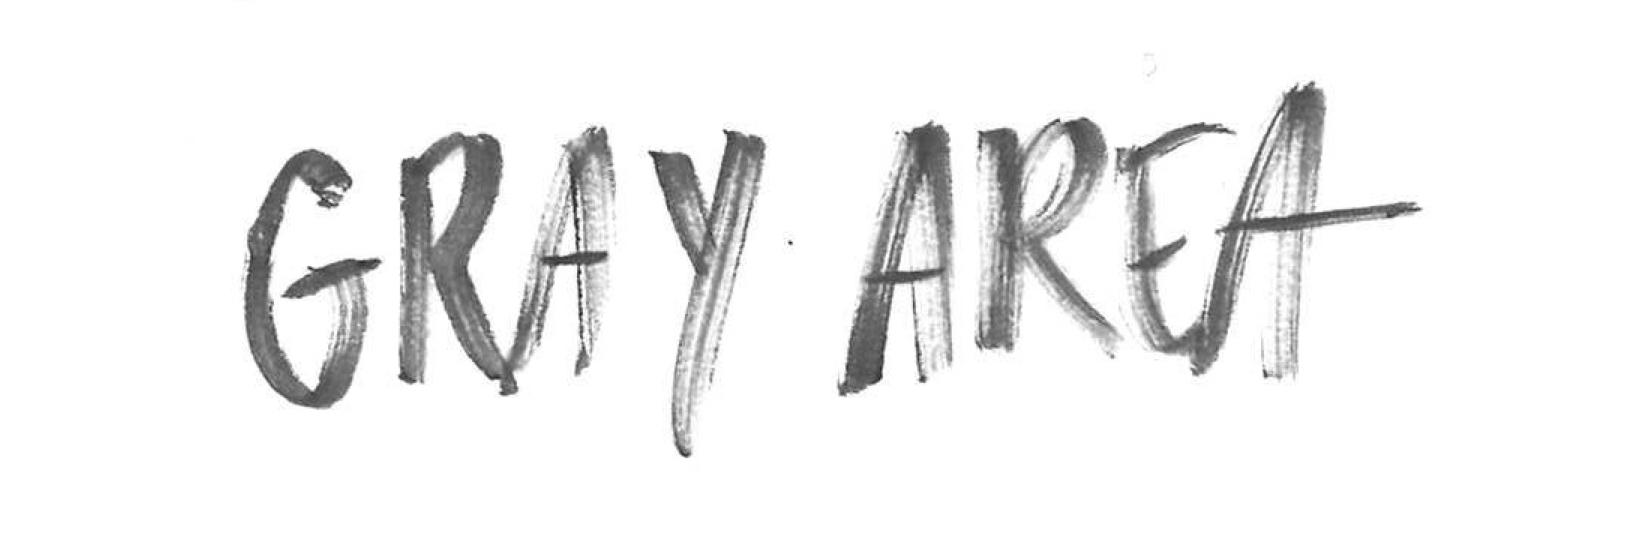 Gray Area Handwriting 003.jpg